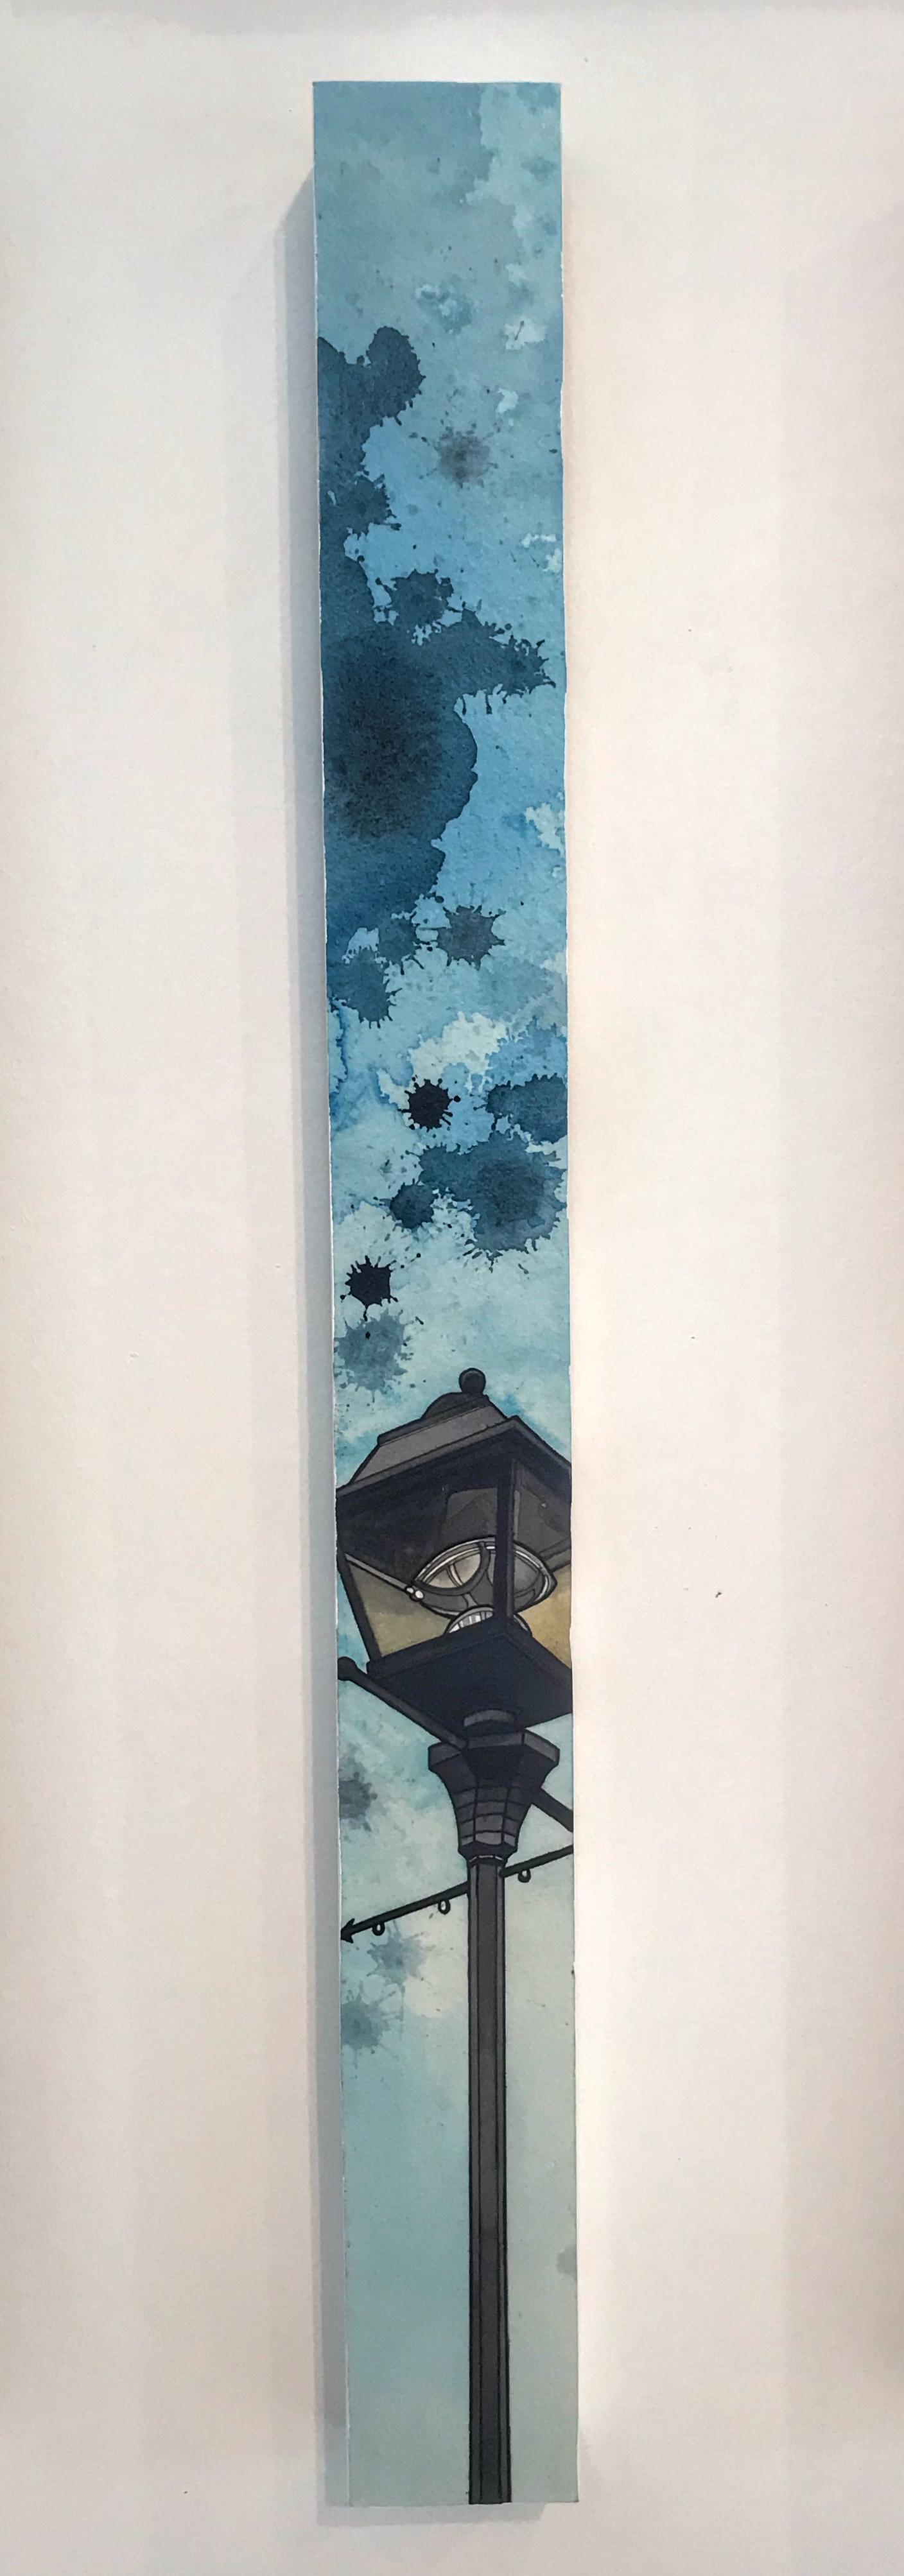 Water Street Lamp #2   3x30